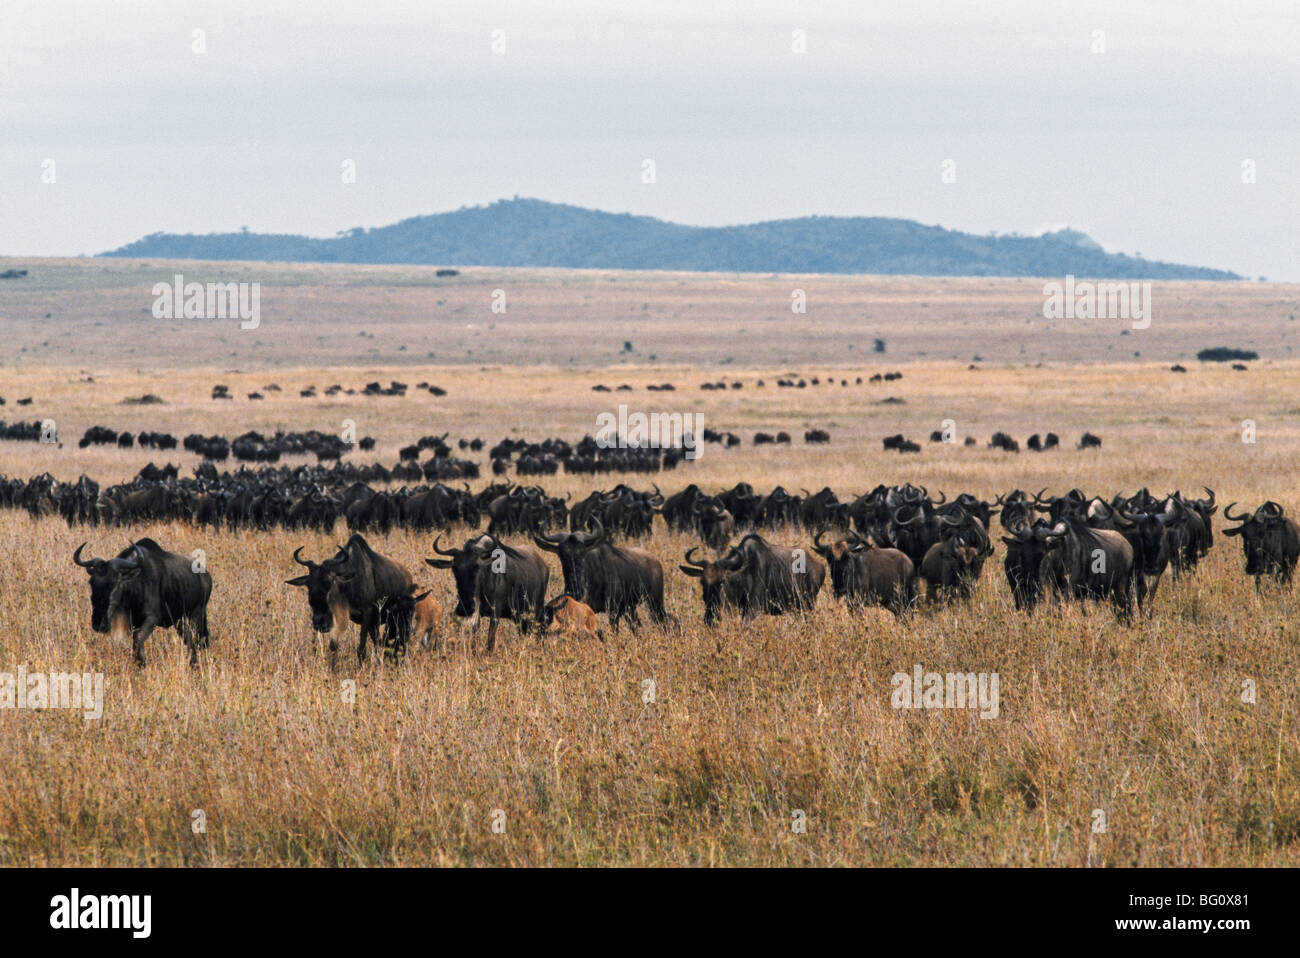 Herd of blue wildebeest, Tanzania, Africa Stock Photo